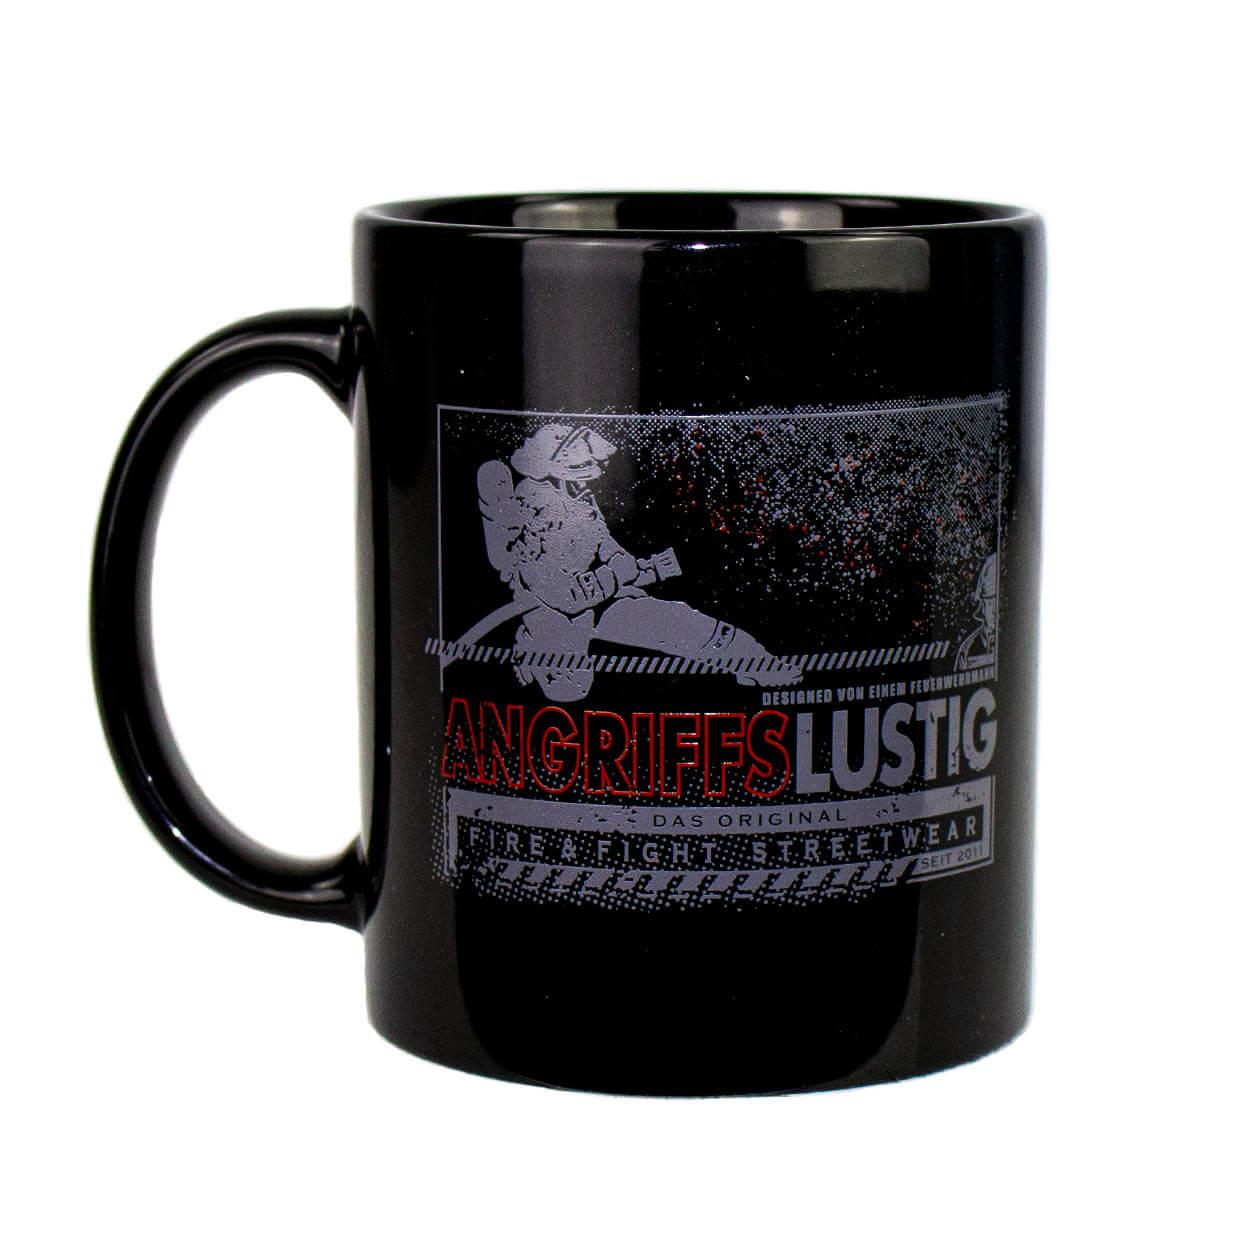 Der Original Angriffslustig® Kaffeebecher